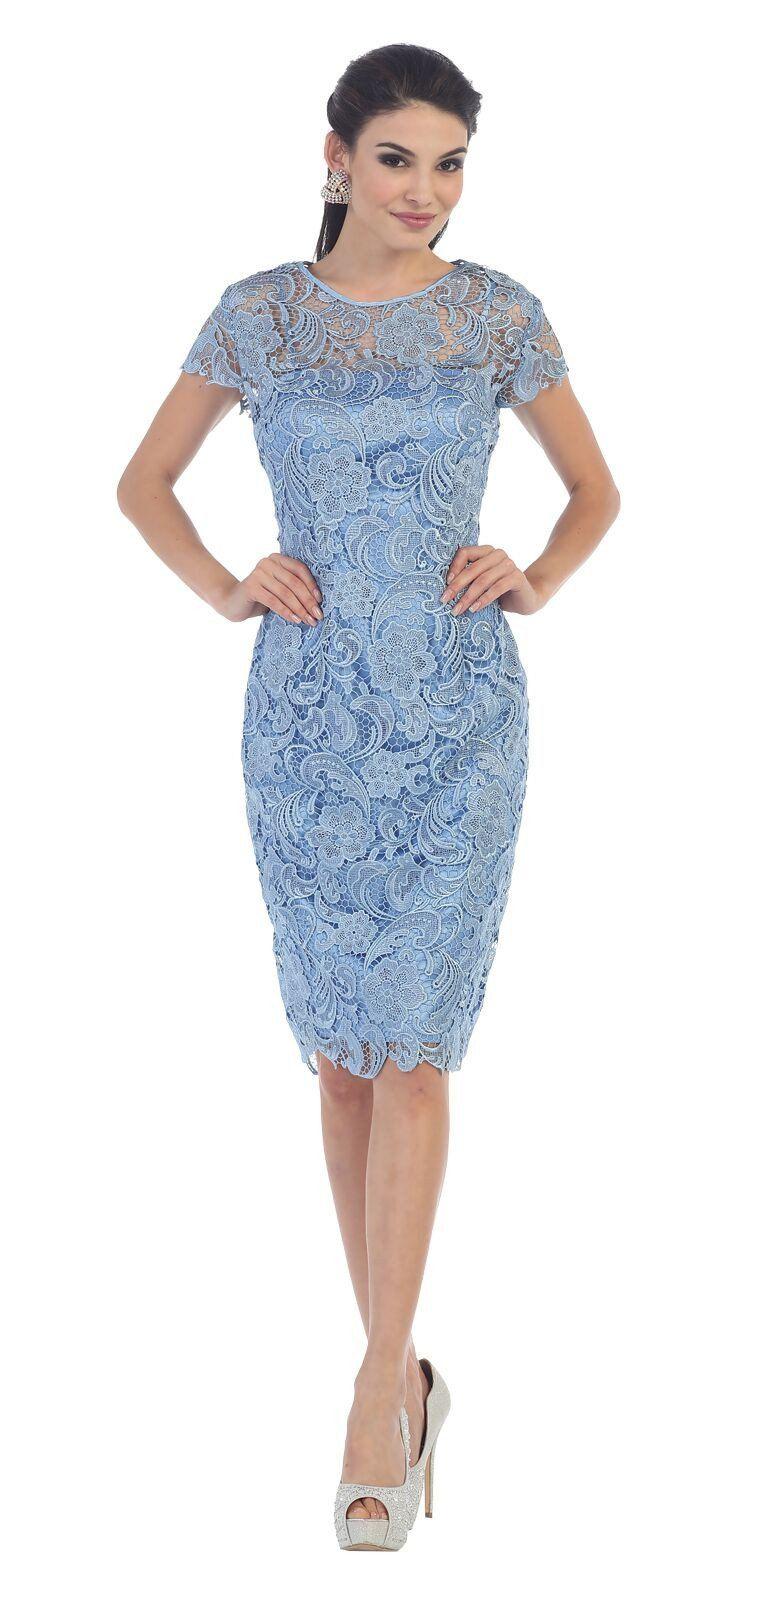 Short Lace Mother of Bride Dress 2018 | Bride dresses, Lace fabric ...